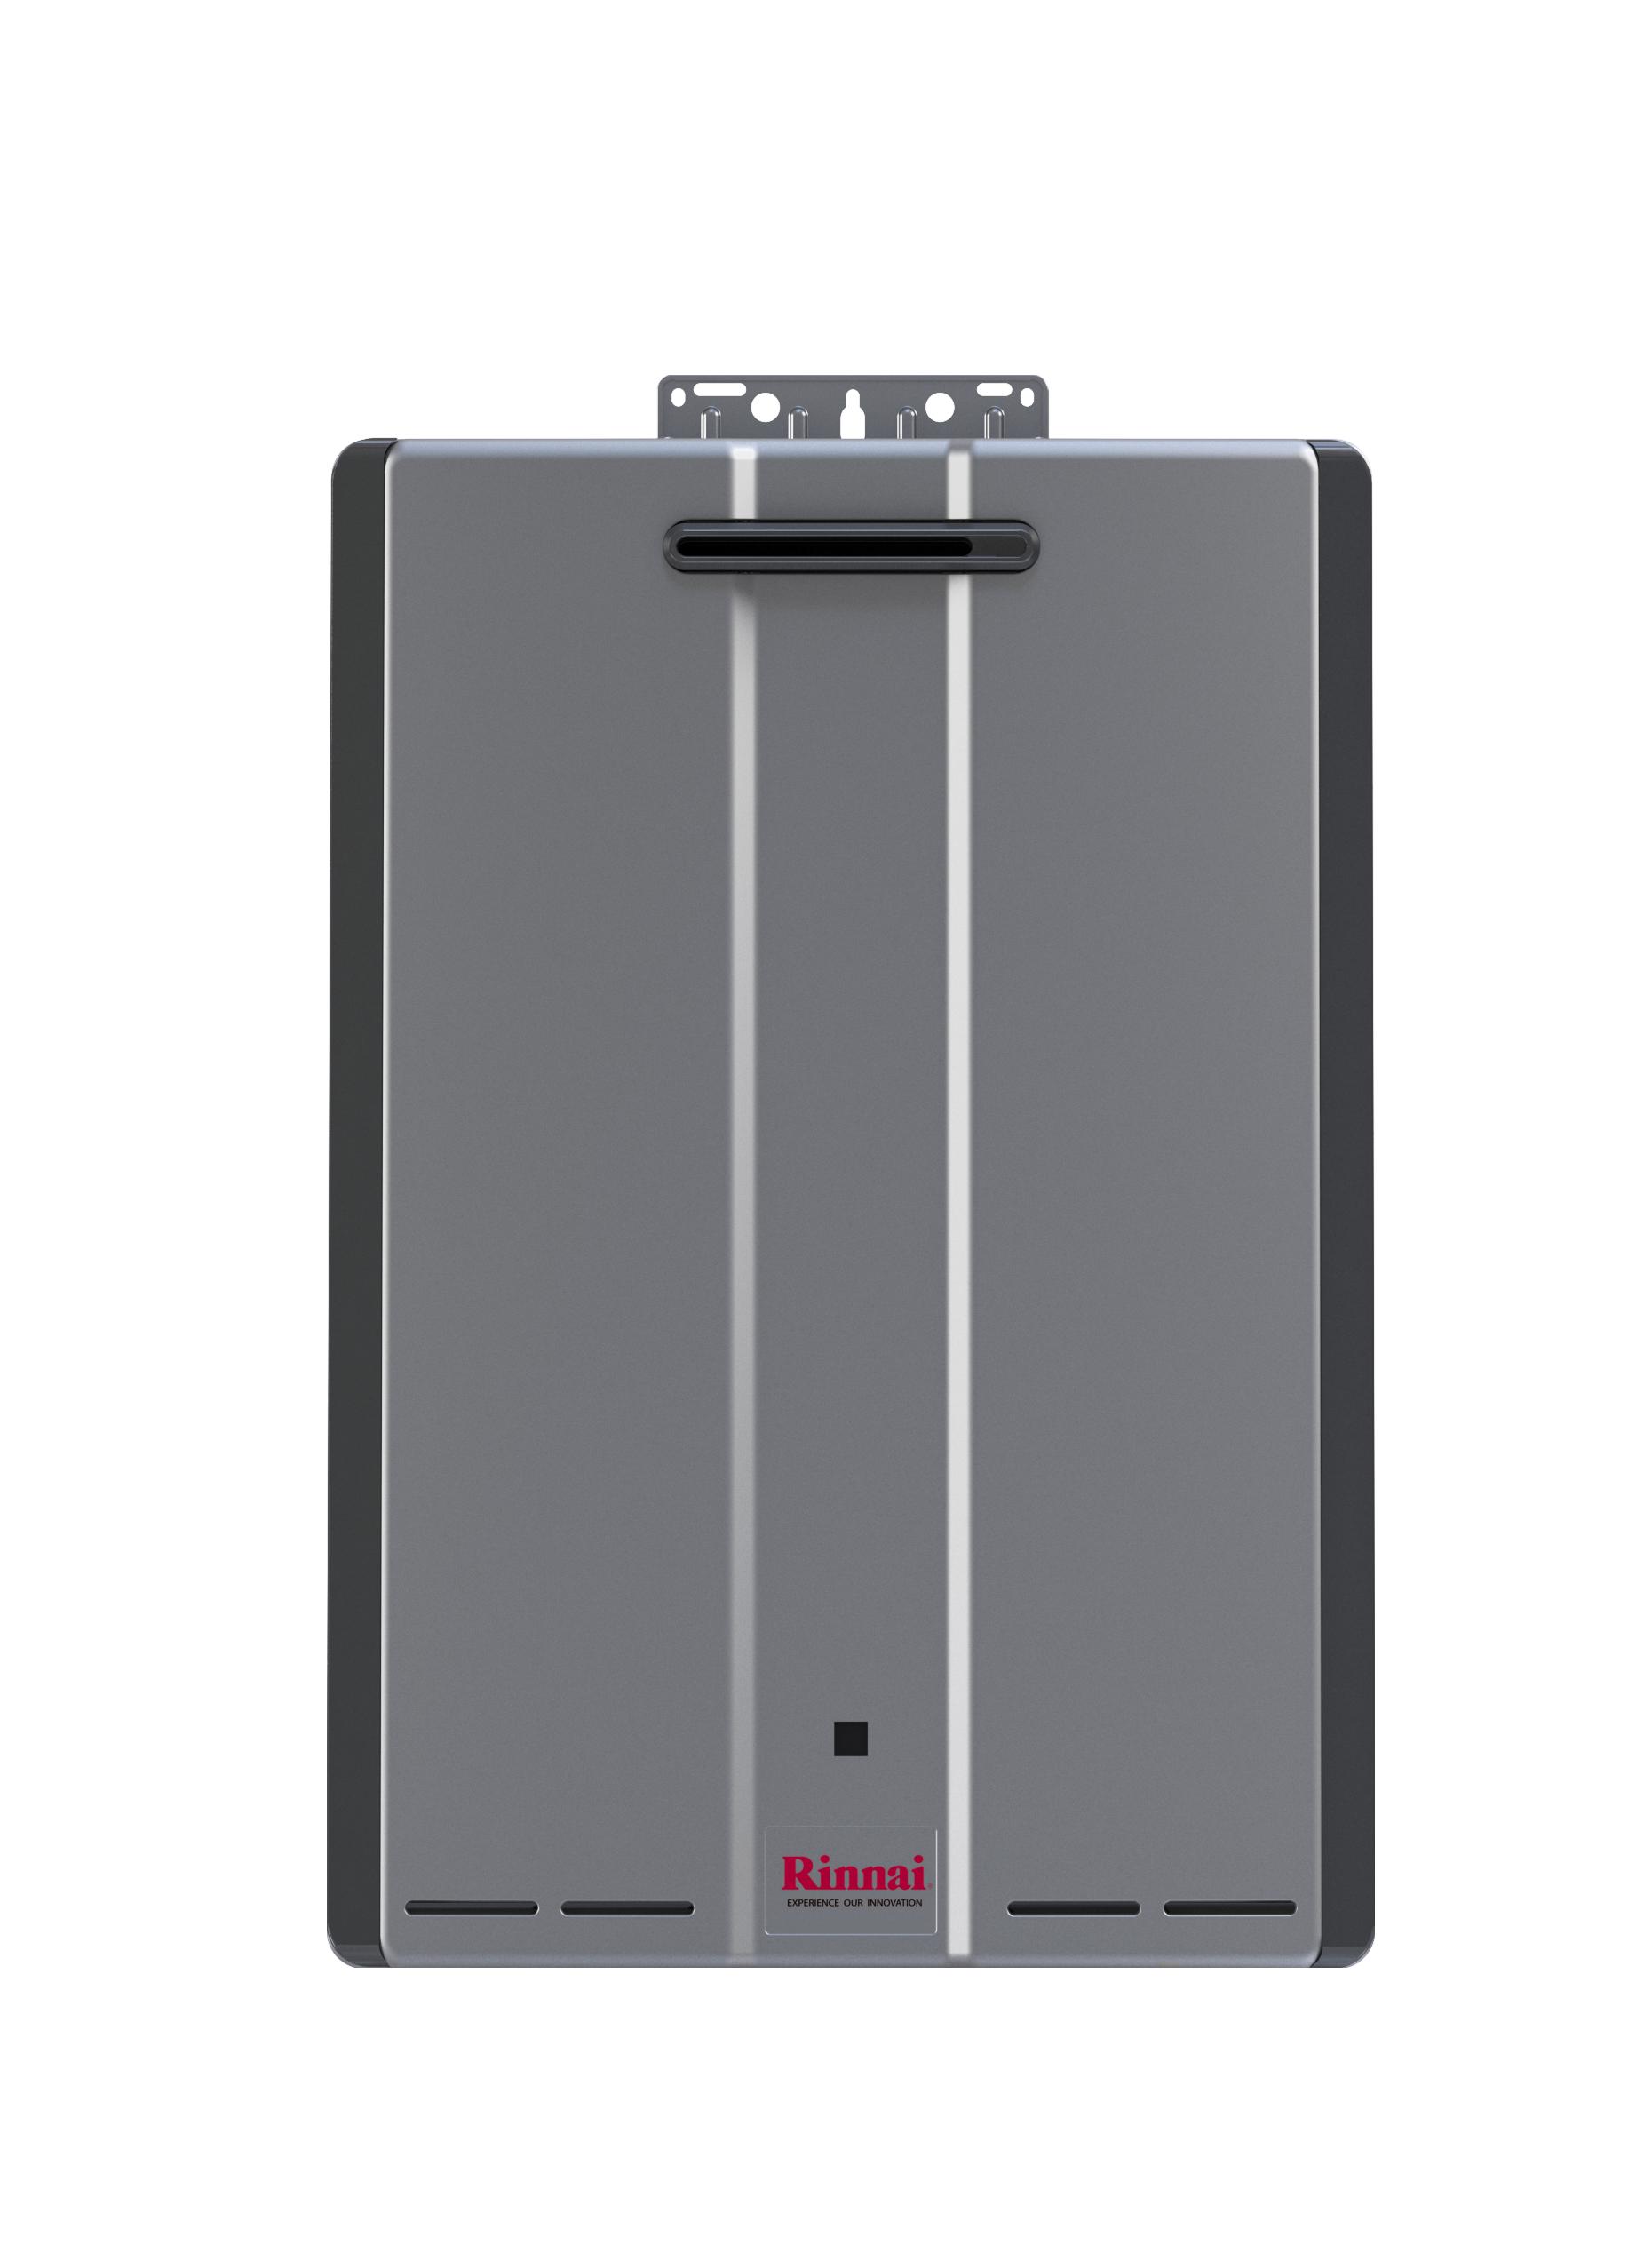 Rinnai RUR160e 8.0 GPM Sensei+ Tankless Hot Water Heater for Outdoor Installation